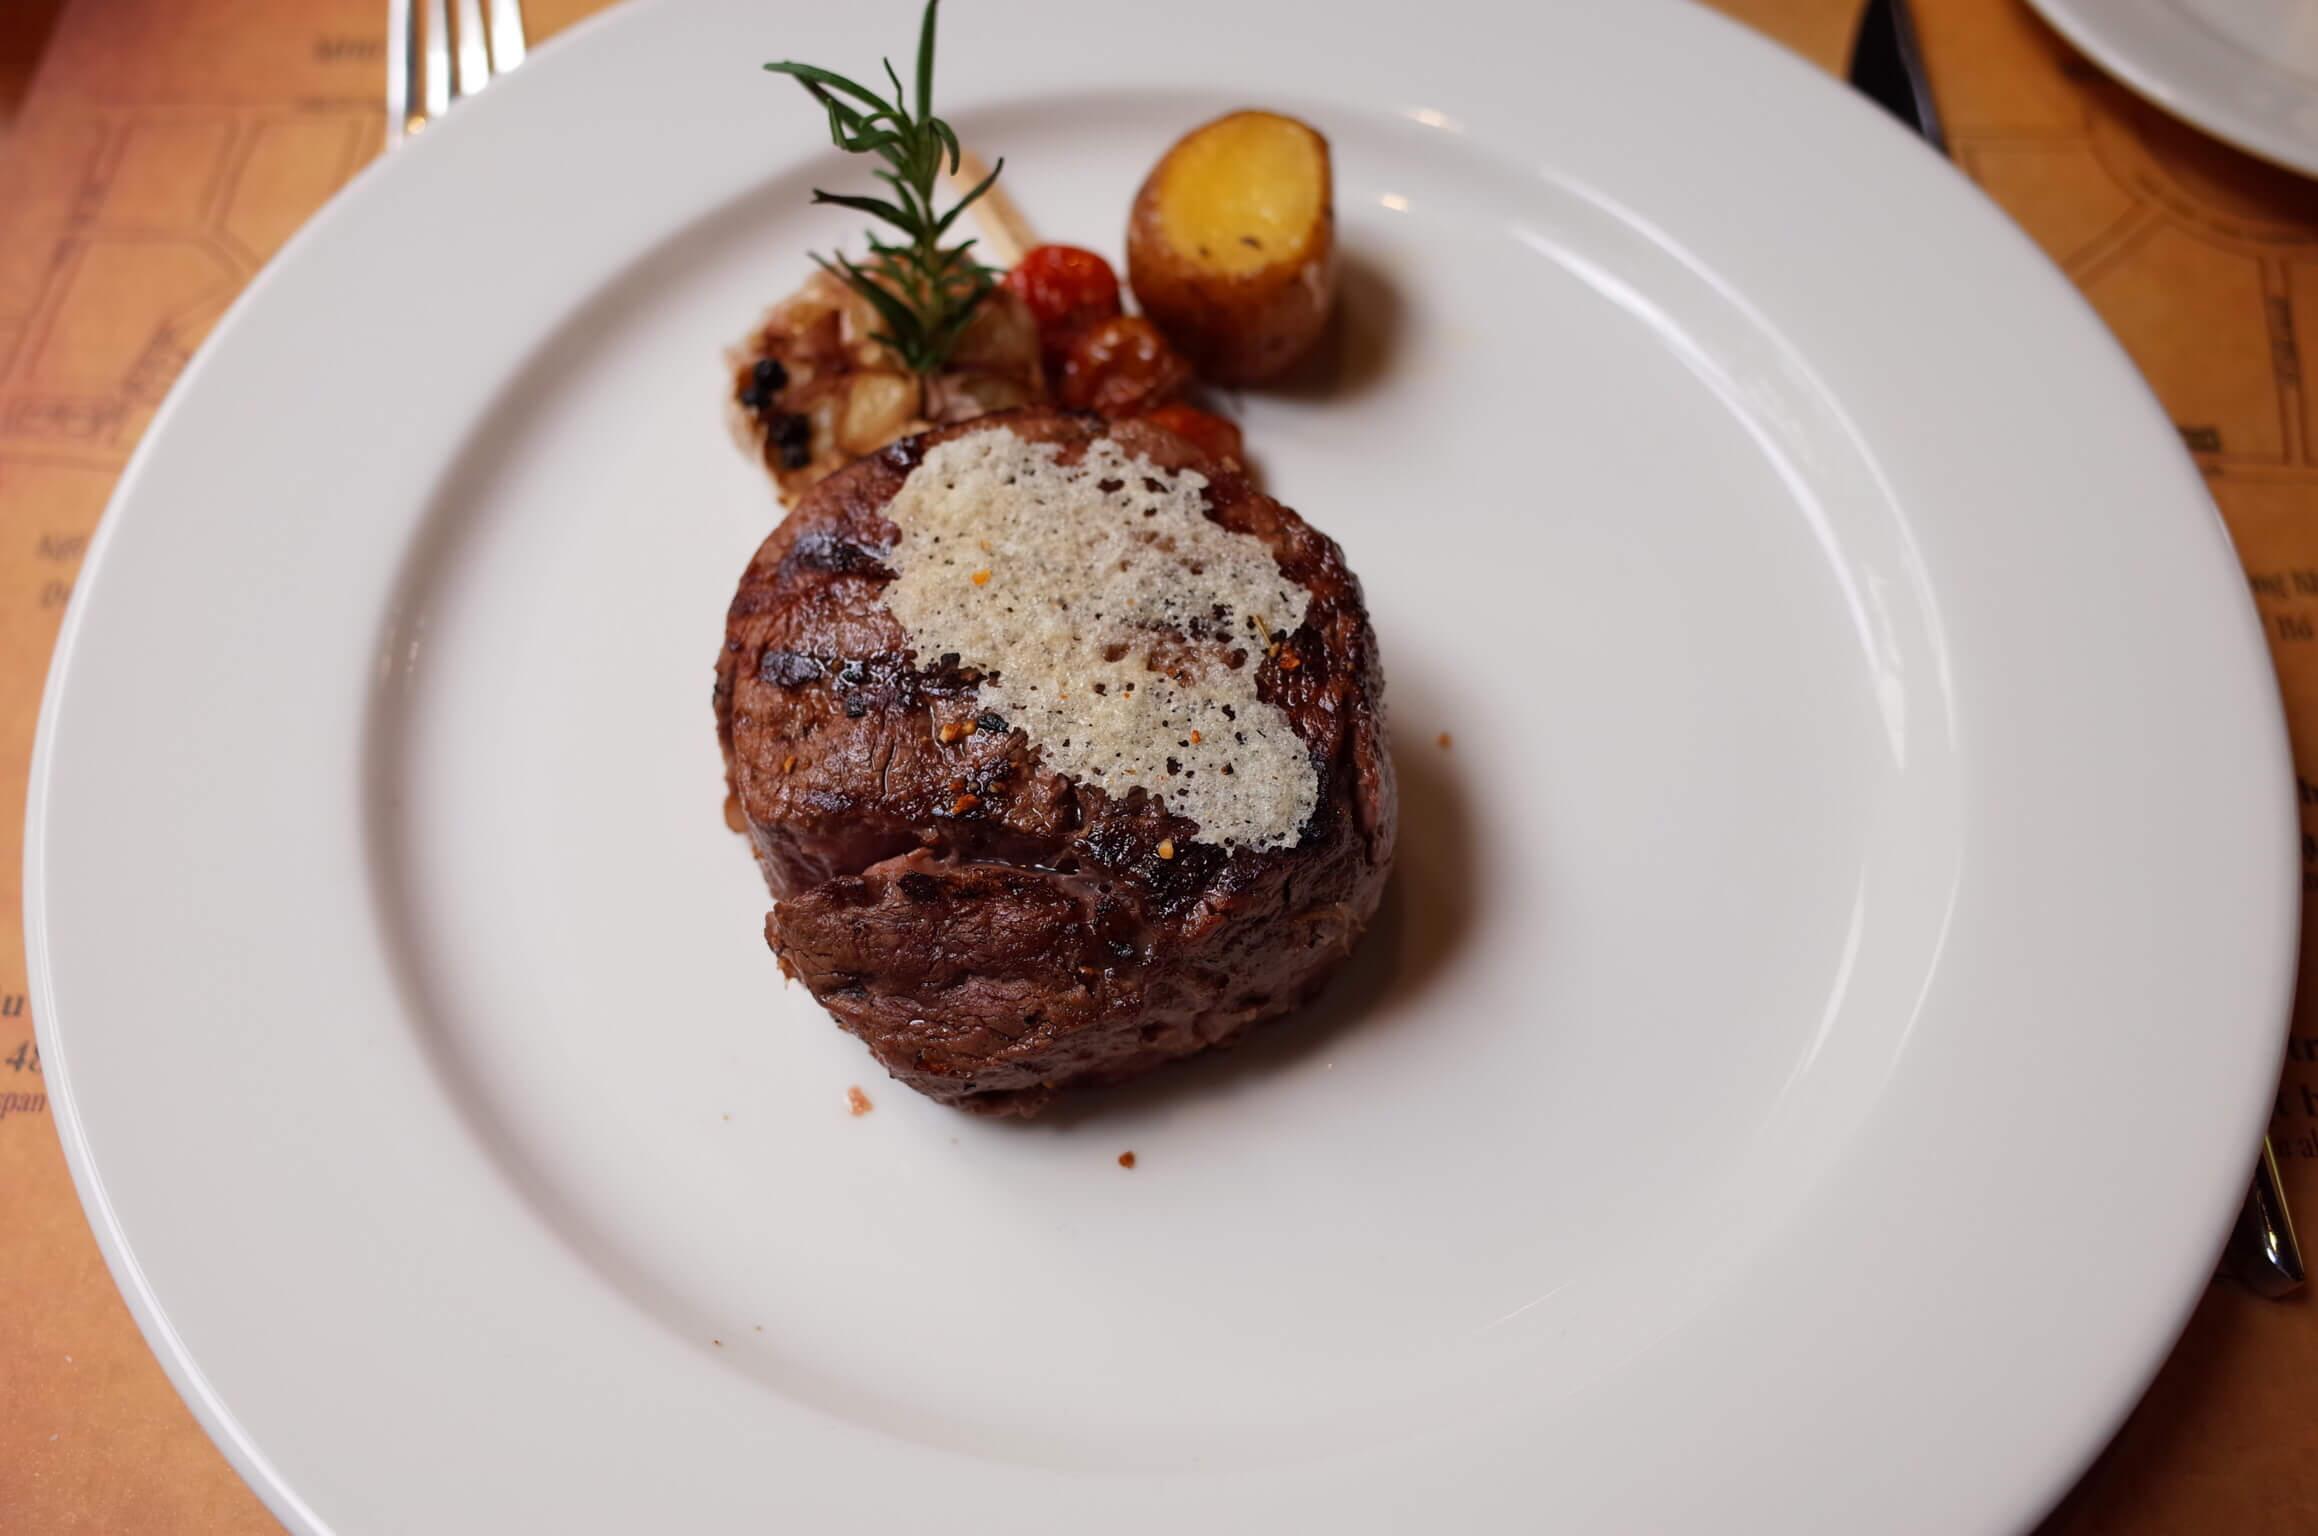 MOO BEEF STEAK 上質なステーキを味わうならこの店!ドンコイ通り